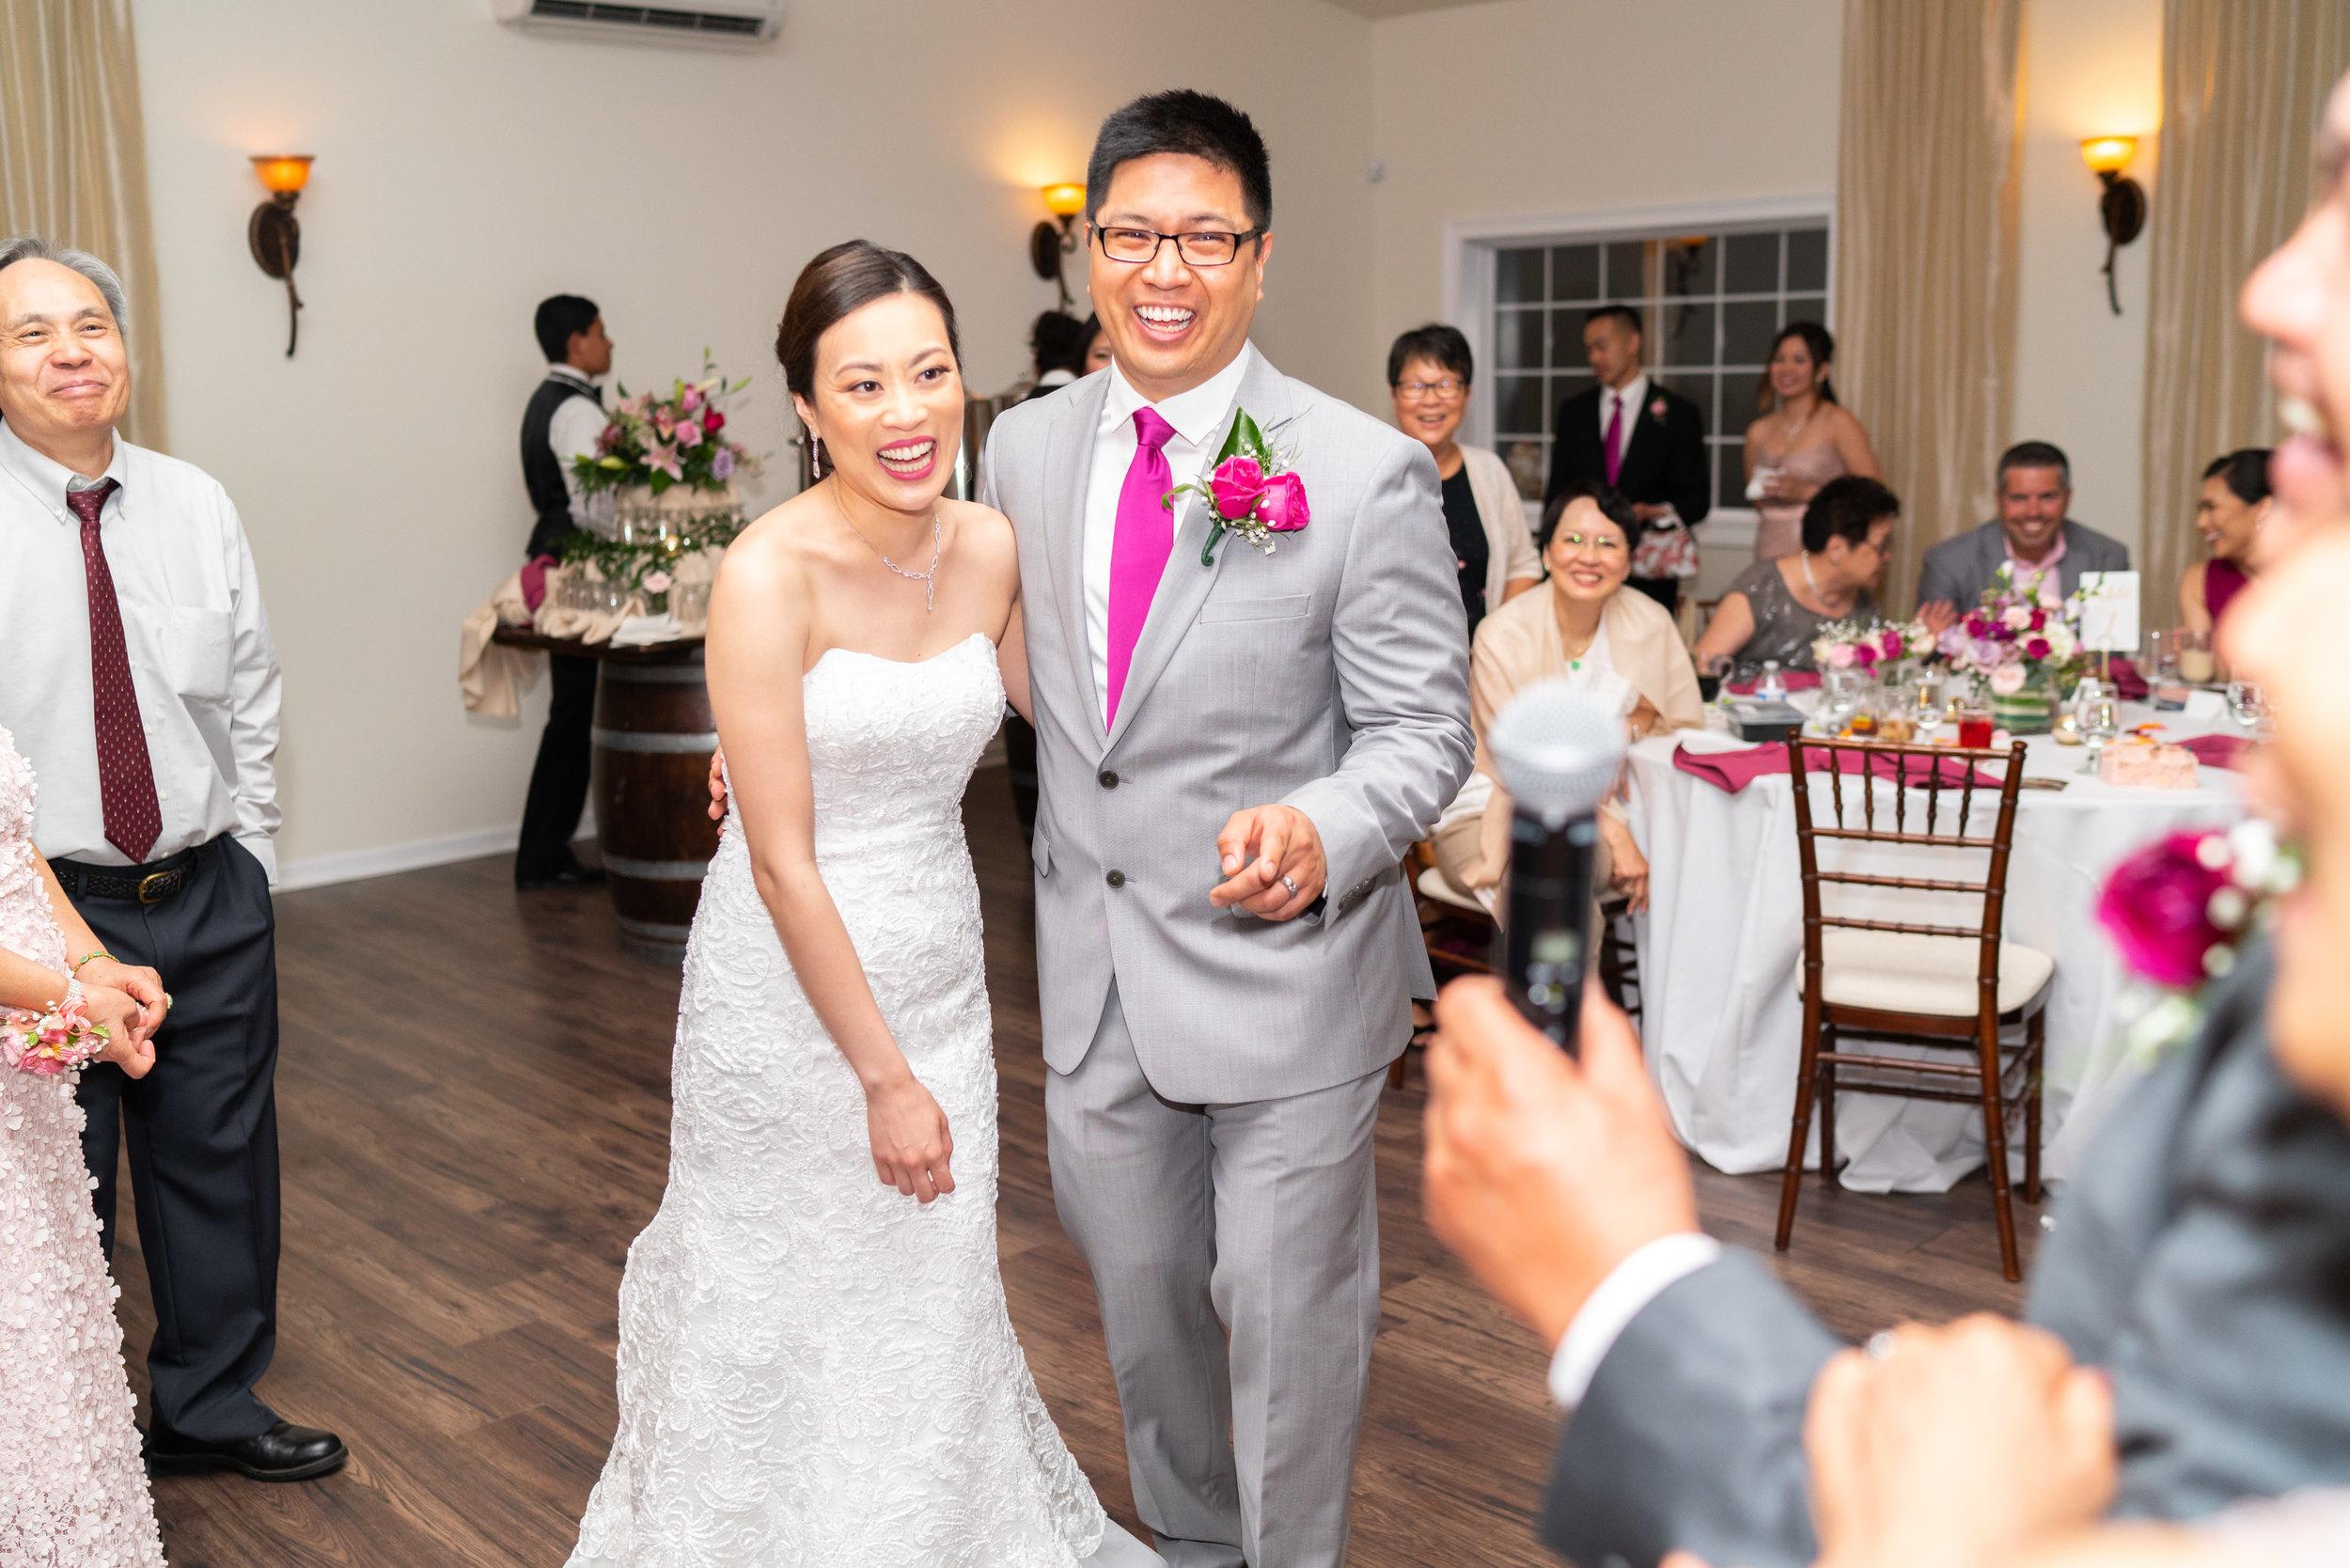 Sony a7riii on camera flash wedding photography